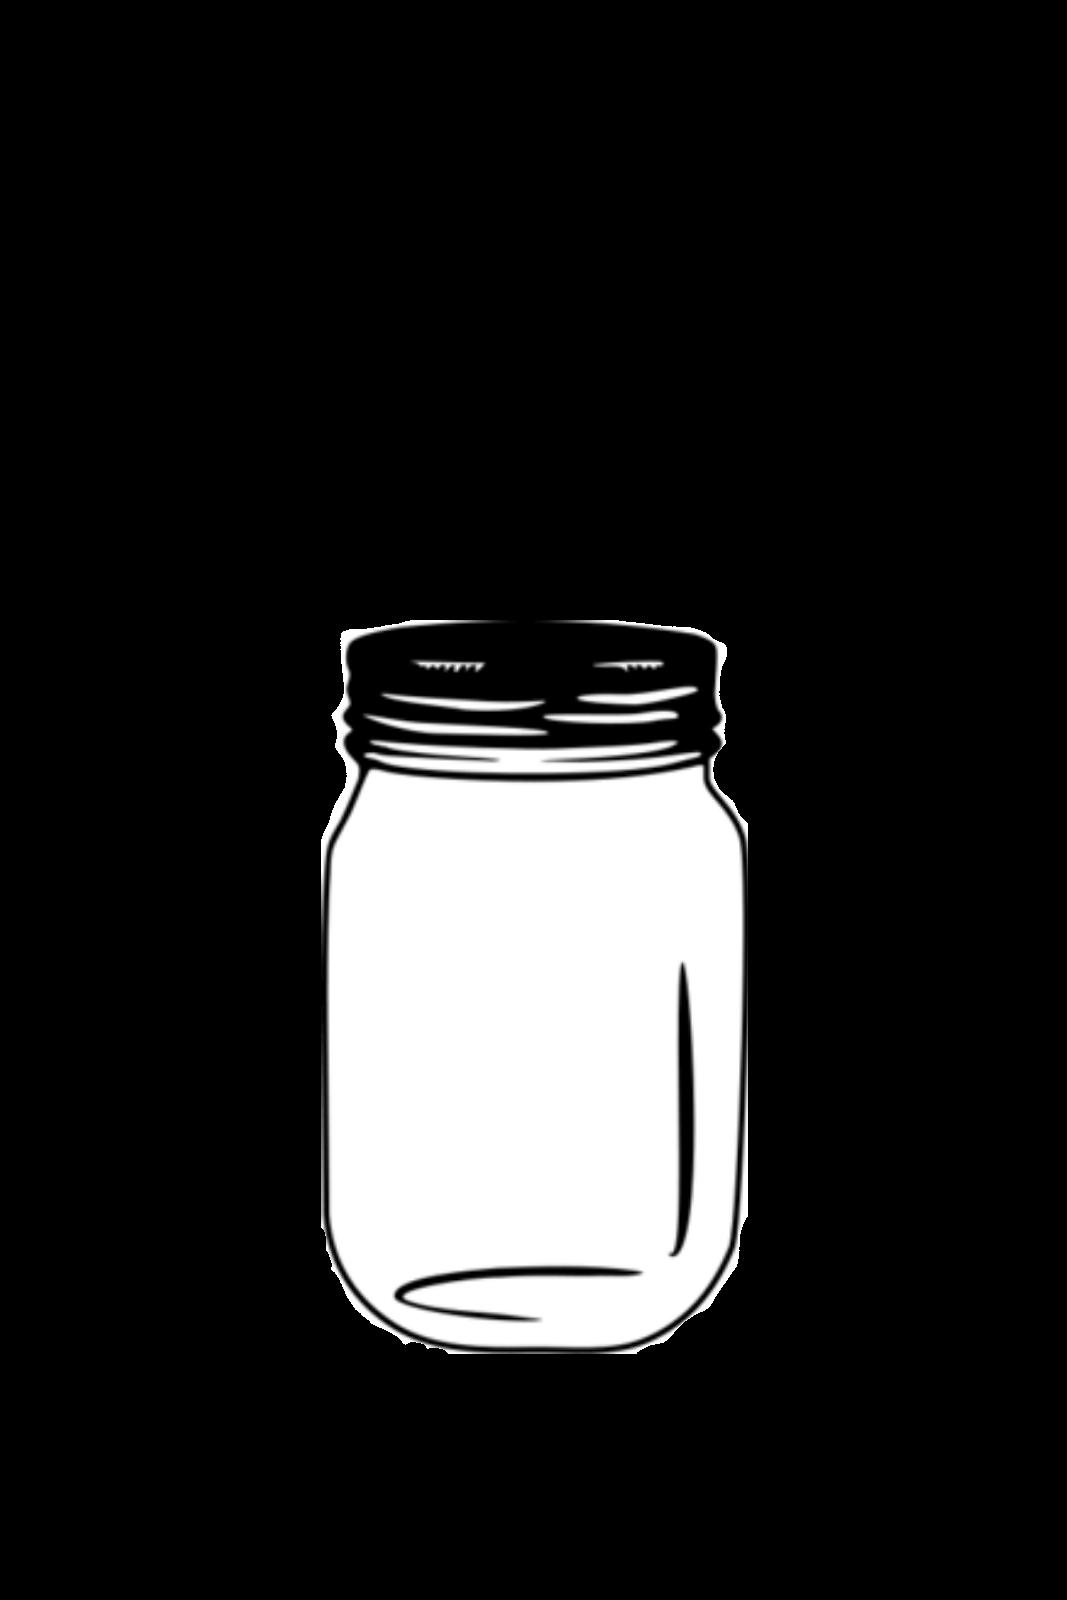 It's just an image of Transformative Mason Jar Printable